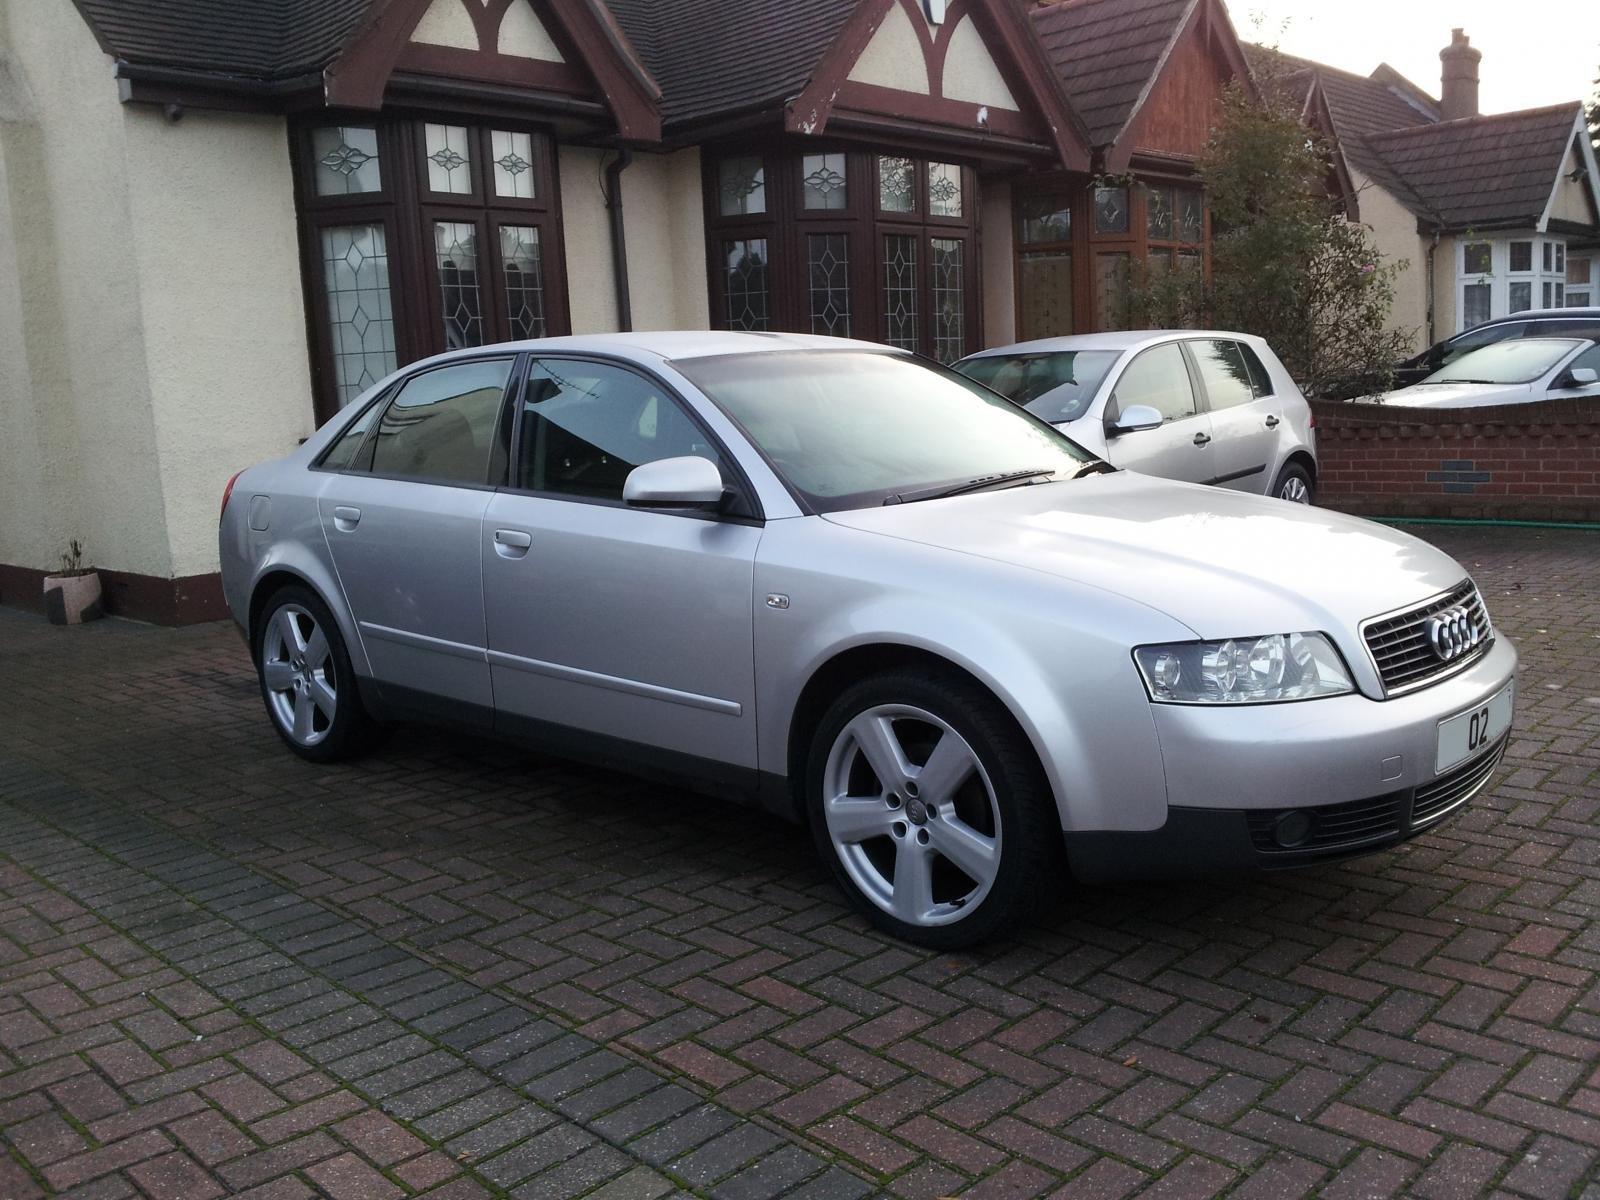 Audi a4 1 9tdi se 2002 mods advice needed 2011 11 13